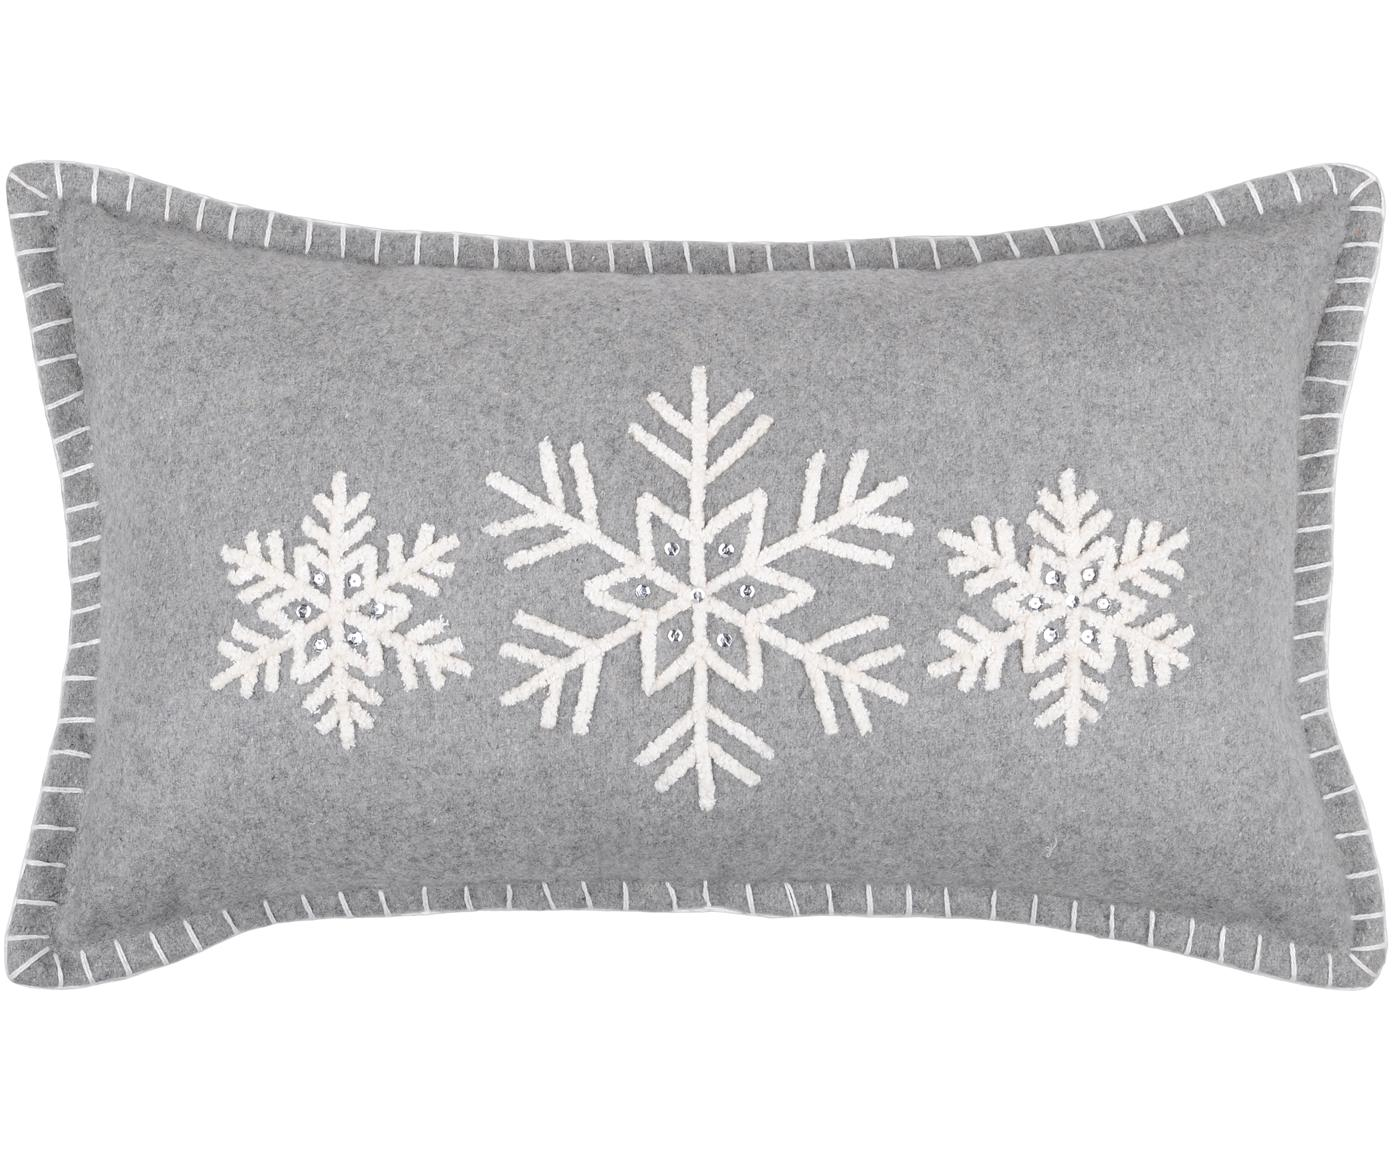 Cuscino con imbottitura Vaujany, Rivestimento: 50% cotone, 32% lana, 7% , Grigio, Larg. 30 x Lung. 50 cm